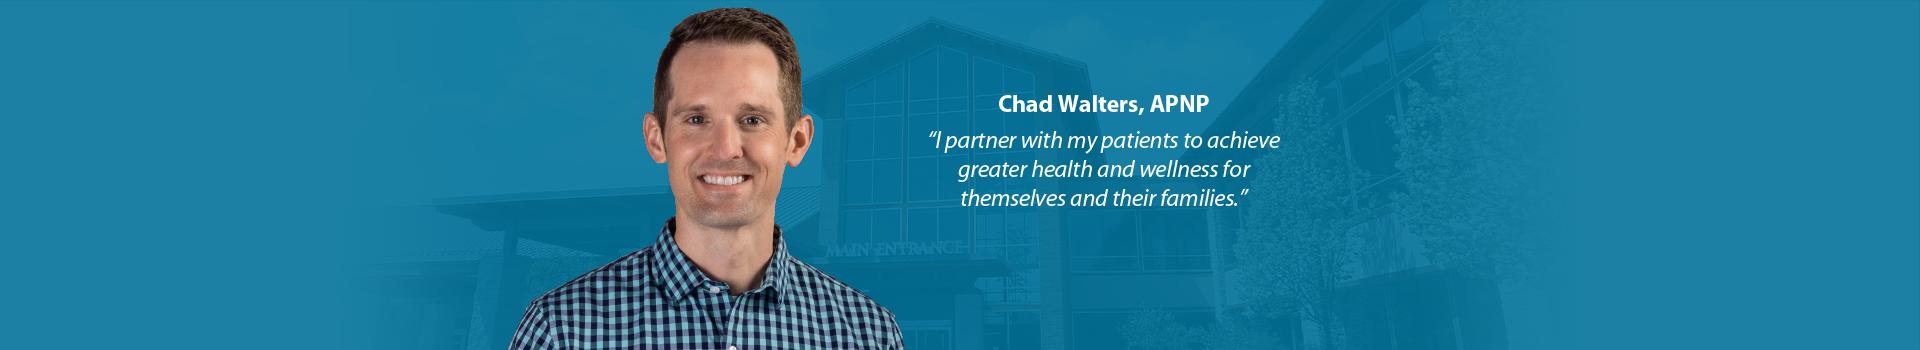 Chad Walters